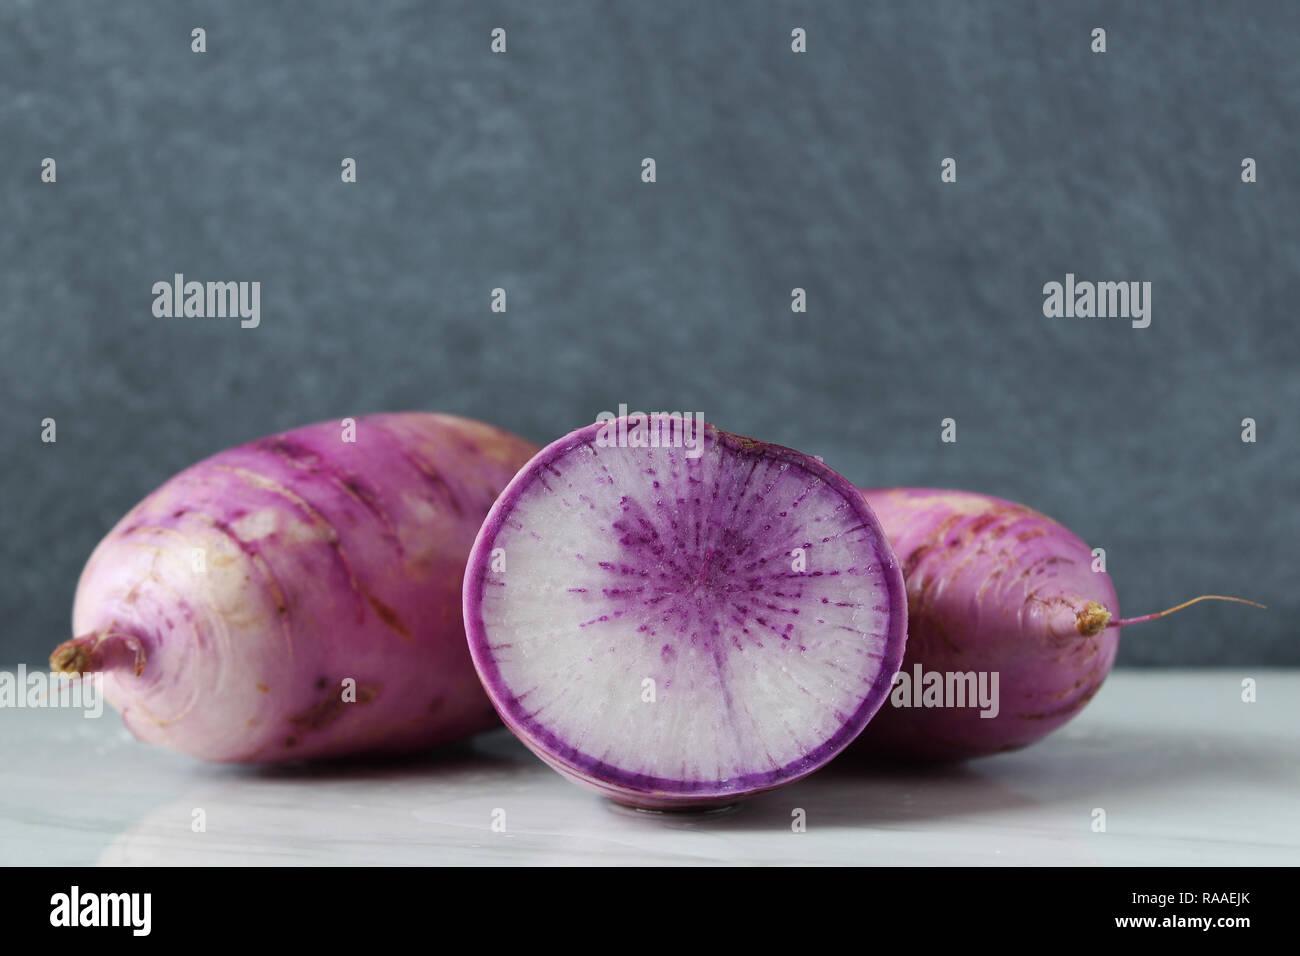 Purple radish whole and cross section. Blackboard copy space. - Stock Image